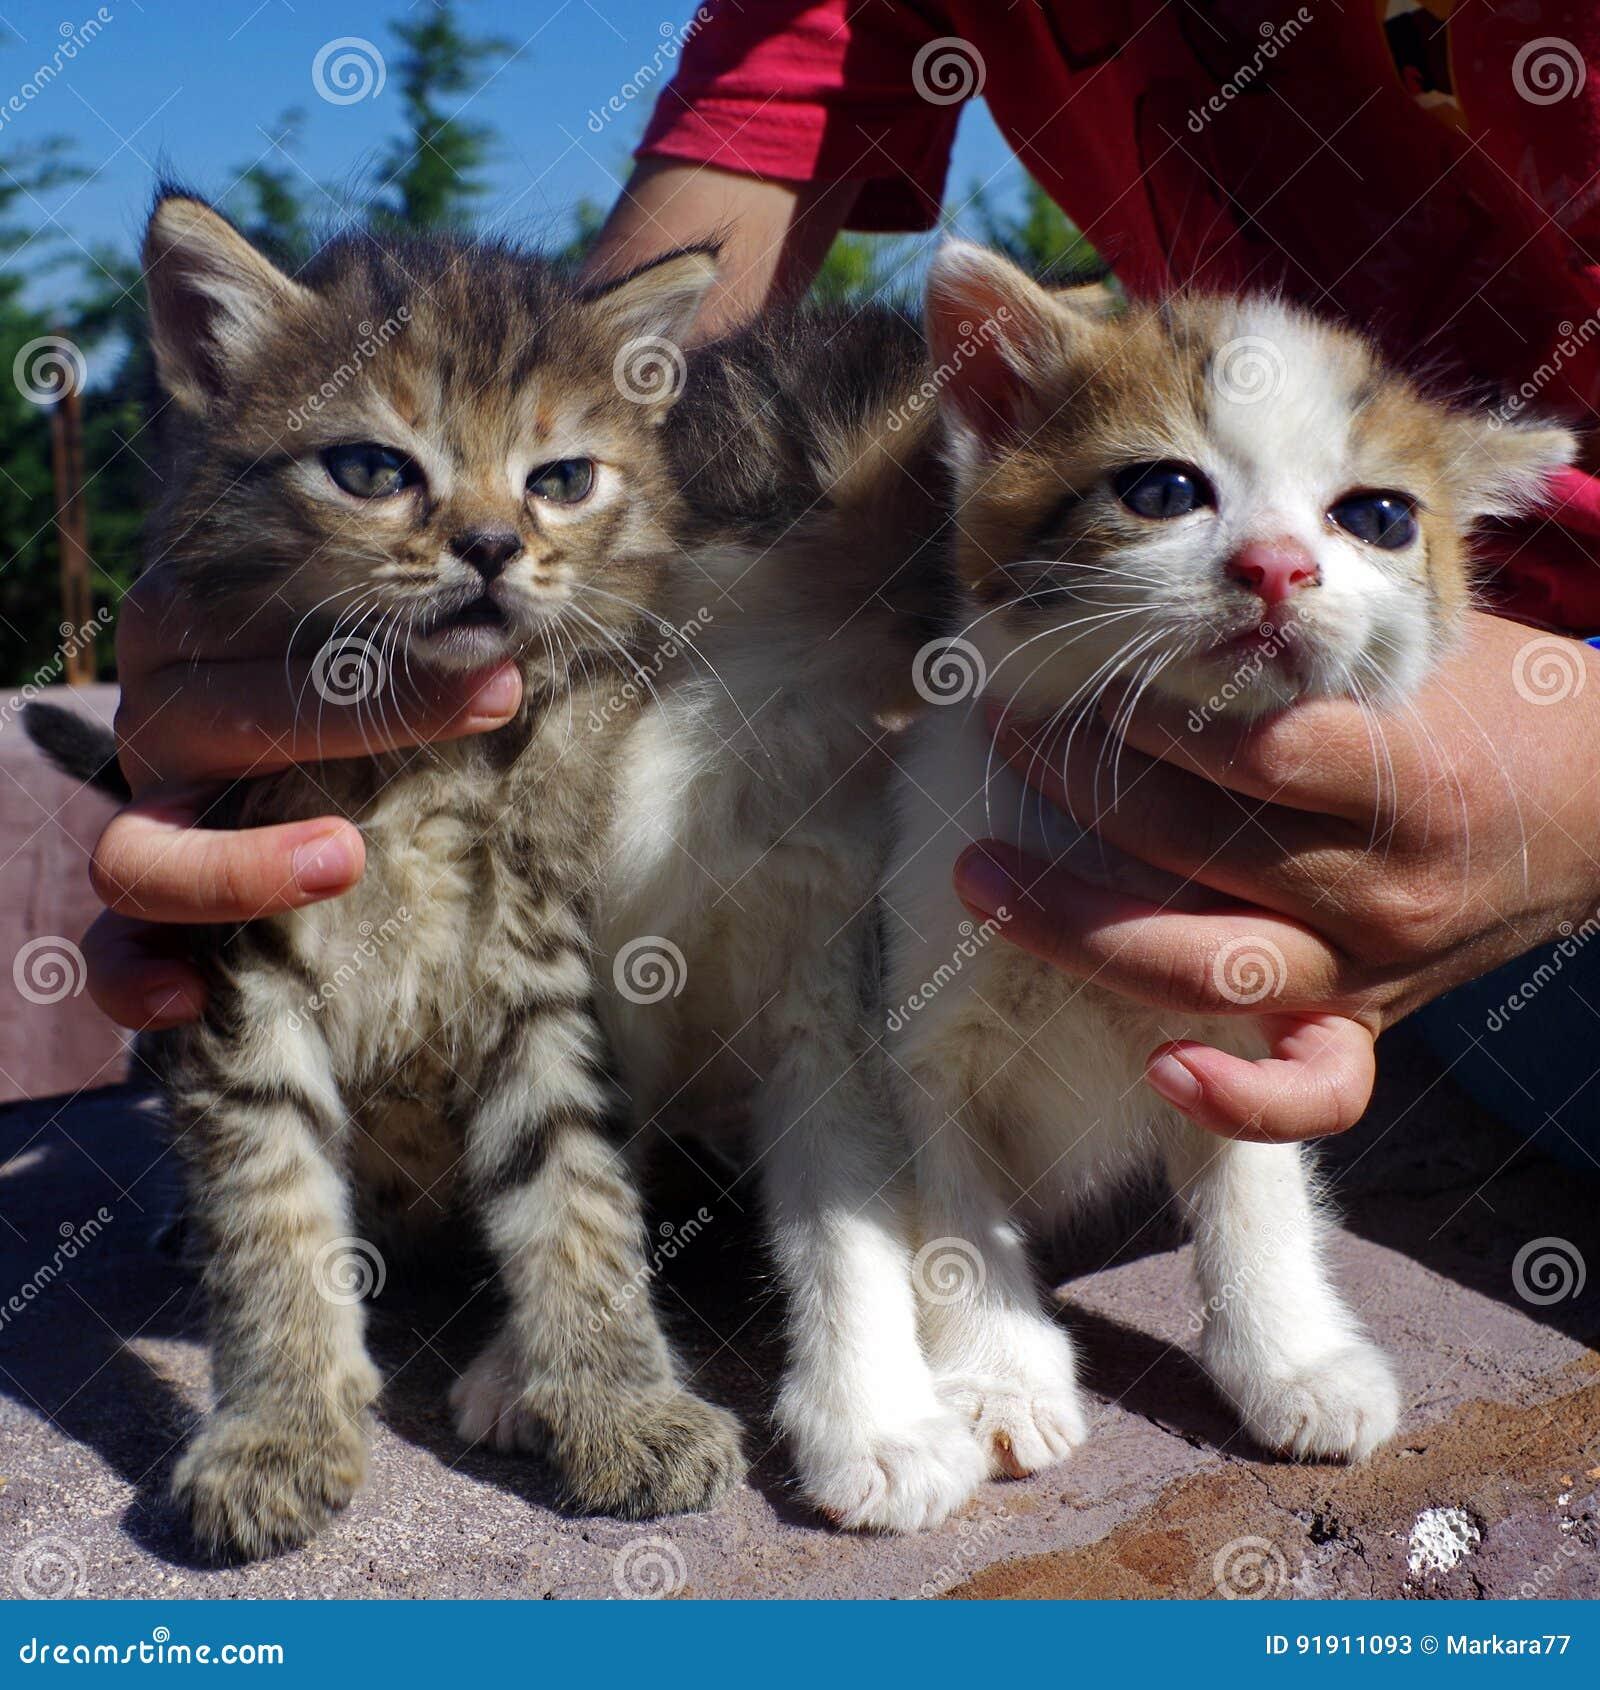 Little Cats In Childrens Hug